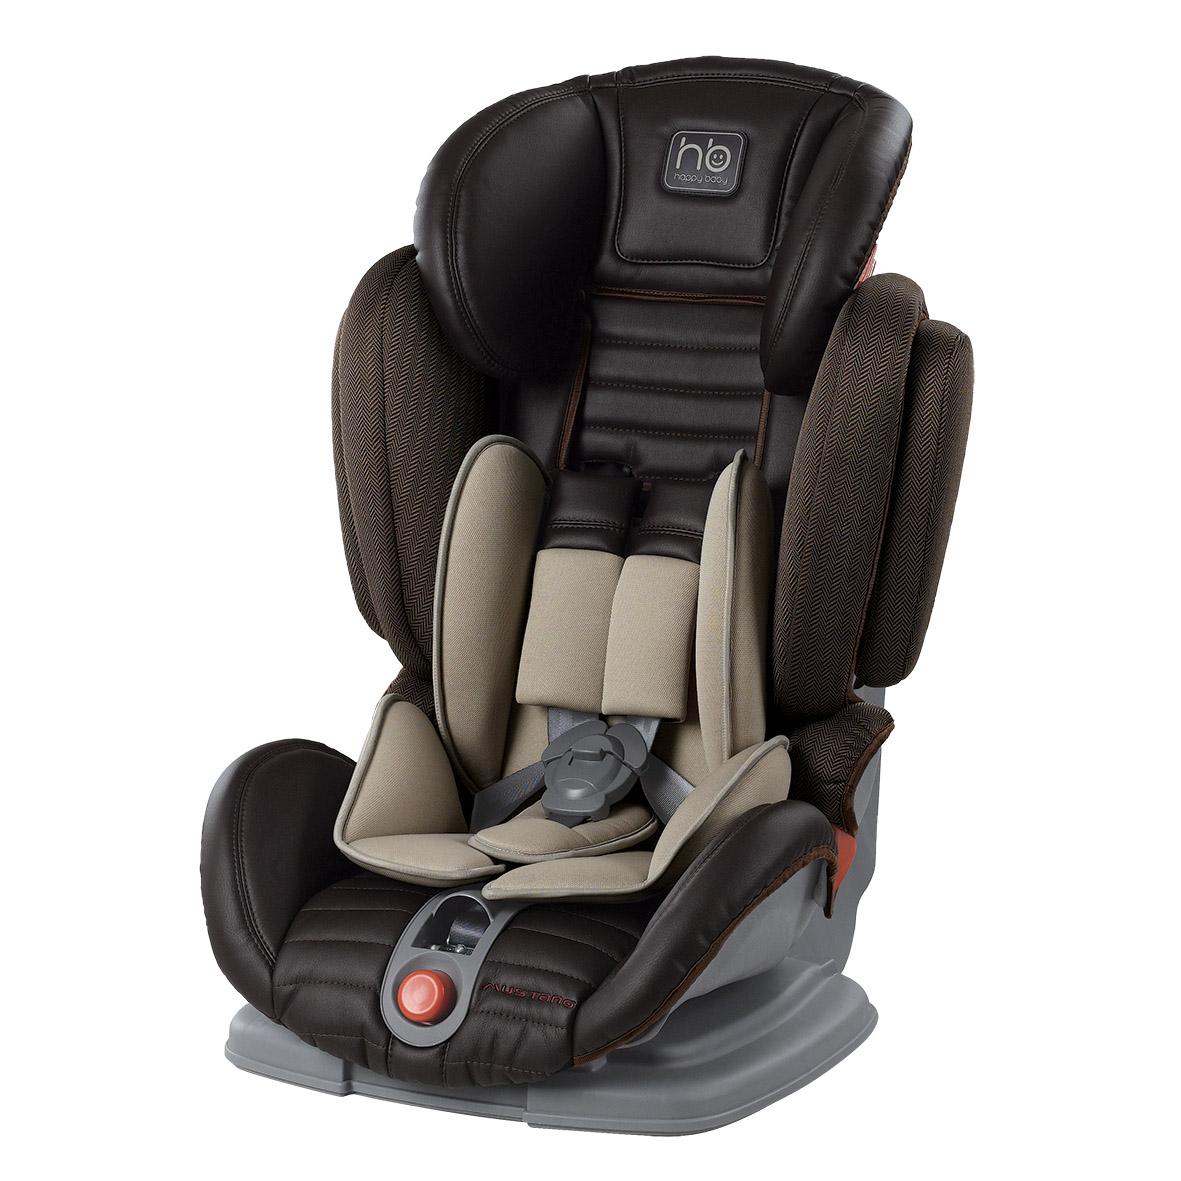 ���������� Happy Baby Mustang 2015 Black